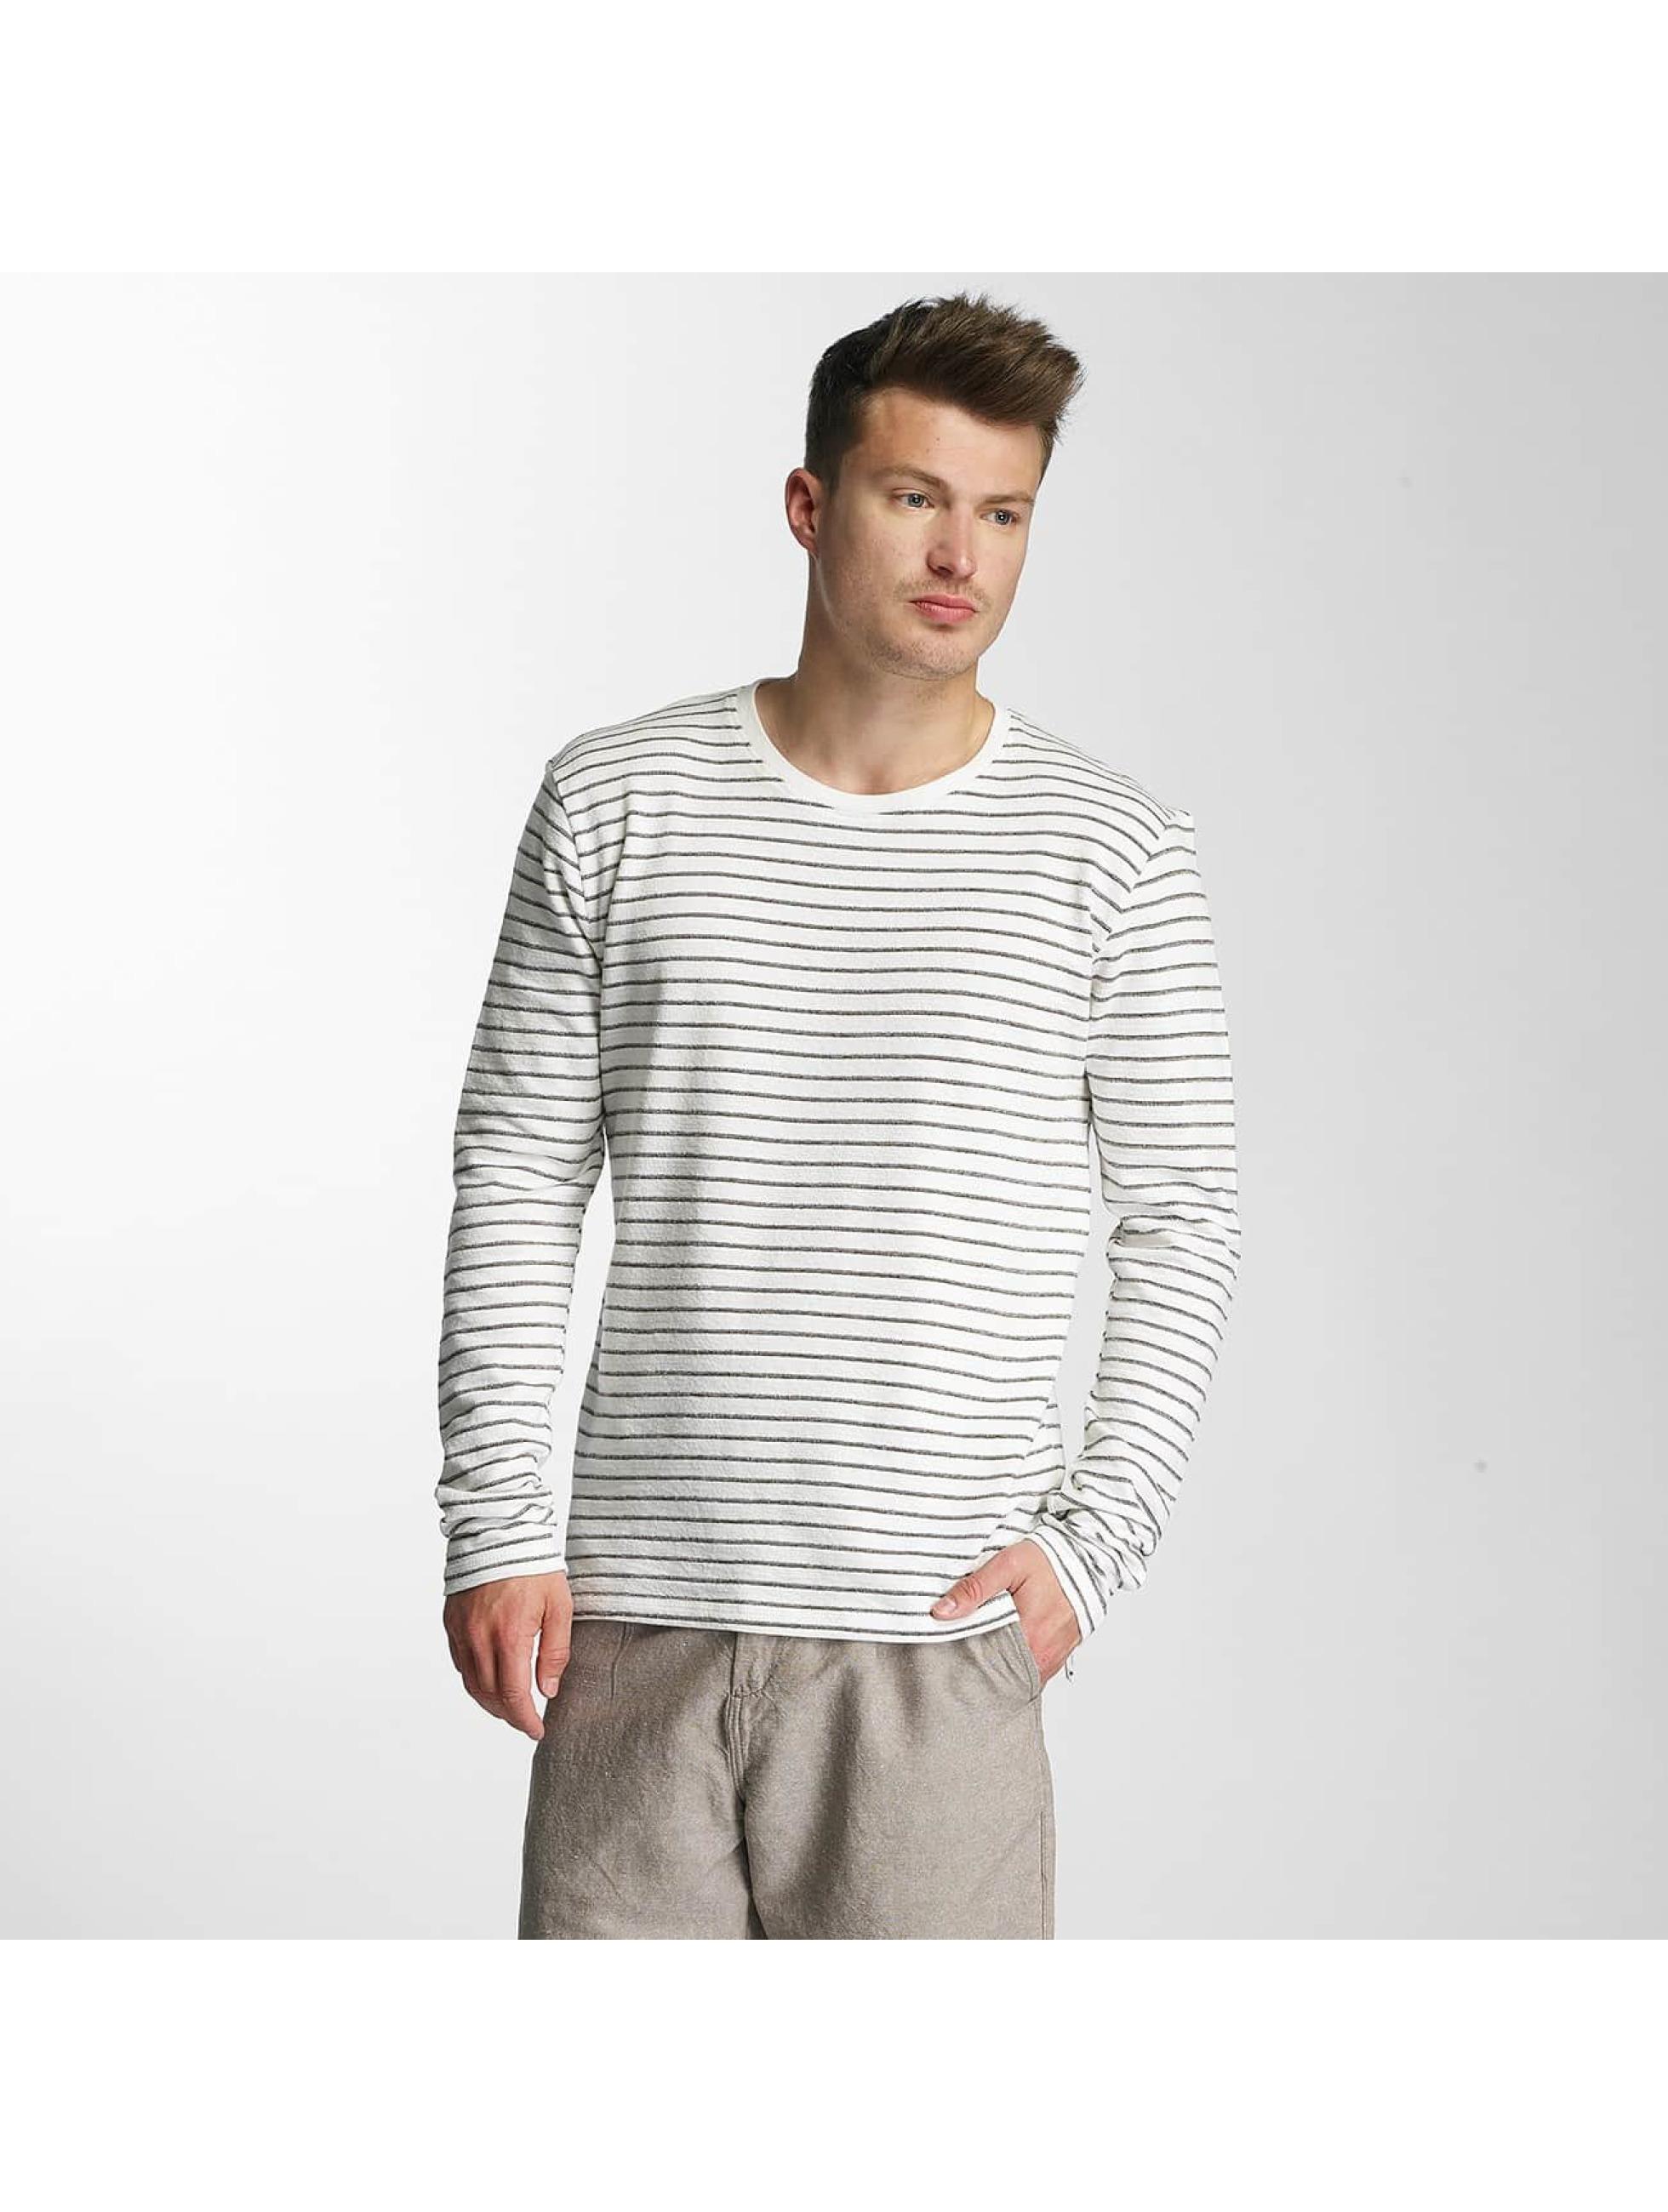 Groß Döbbern Angebote Only & Sons Männer Pullover onsPami in weiß